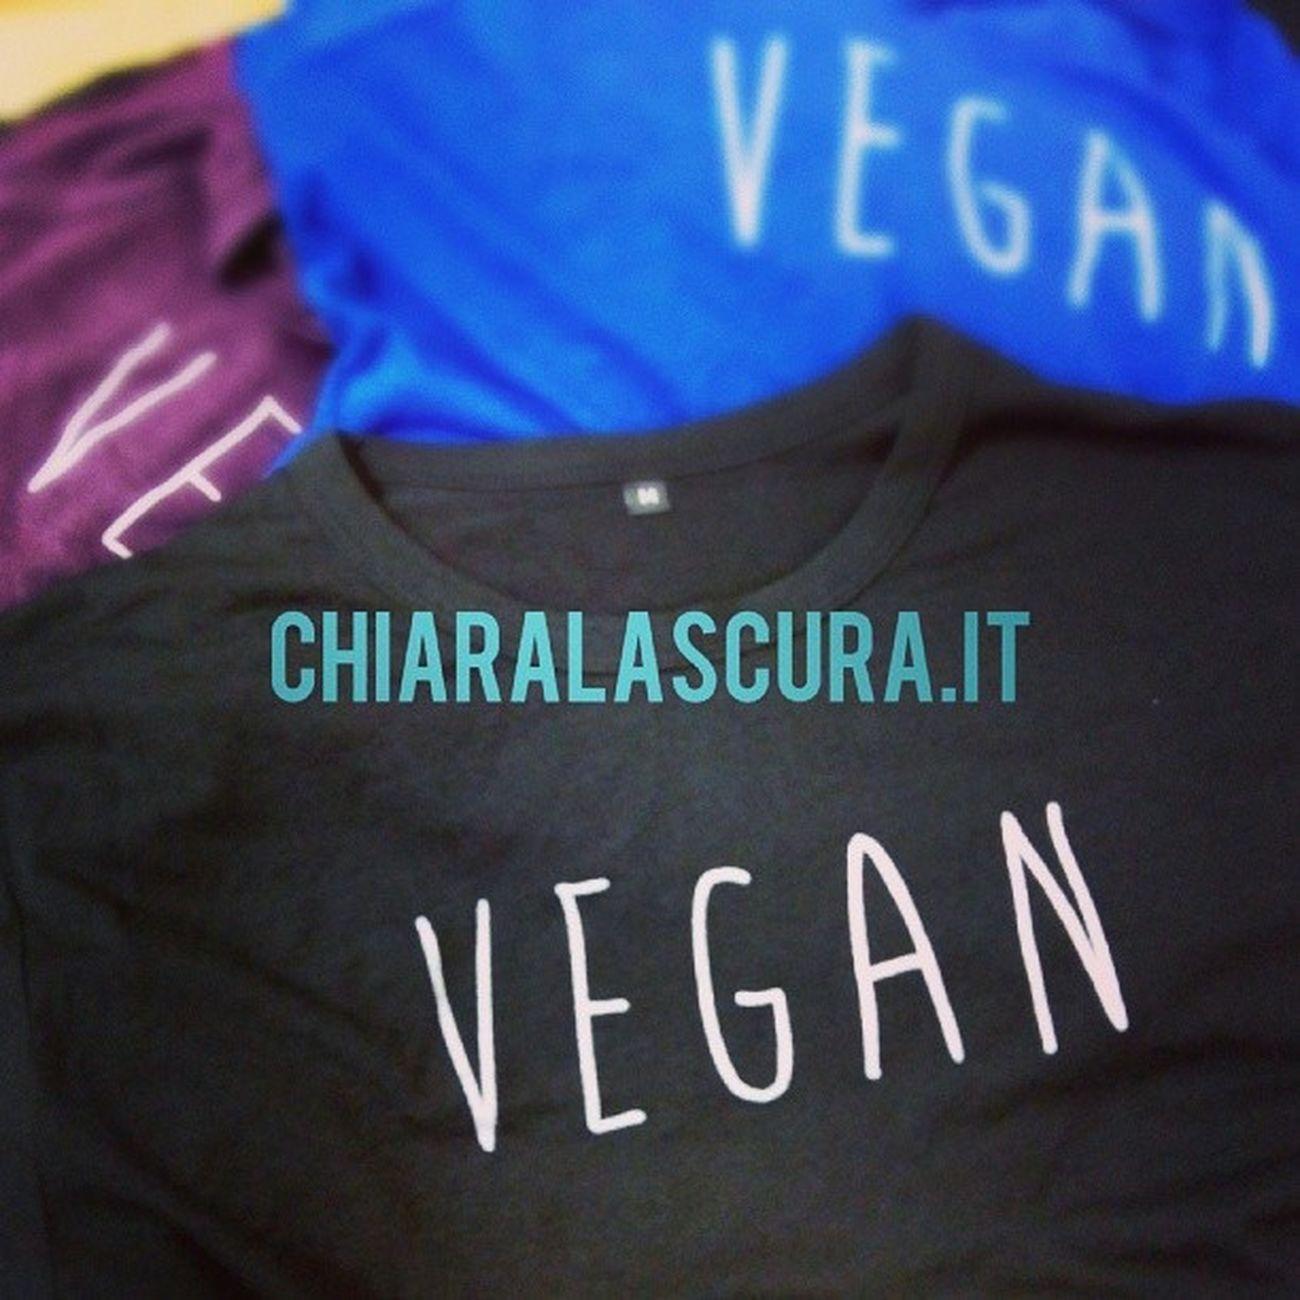 #vegfestuk #chiaralascura #vegan #vegatshirts #vegano #colors #london Colors London Vegan Organic Vegfest Chiaralascura Vegantshirts Meatismurder Vegano Biologico Vegfestuk Vegatshirts